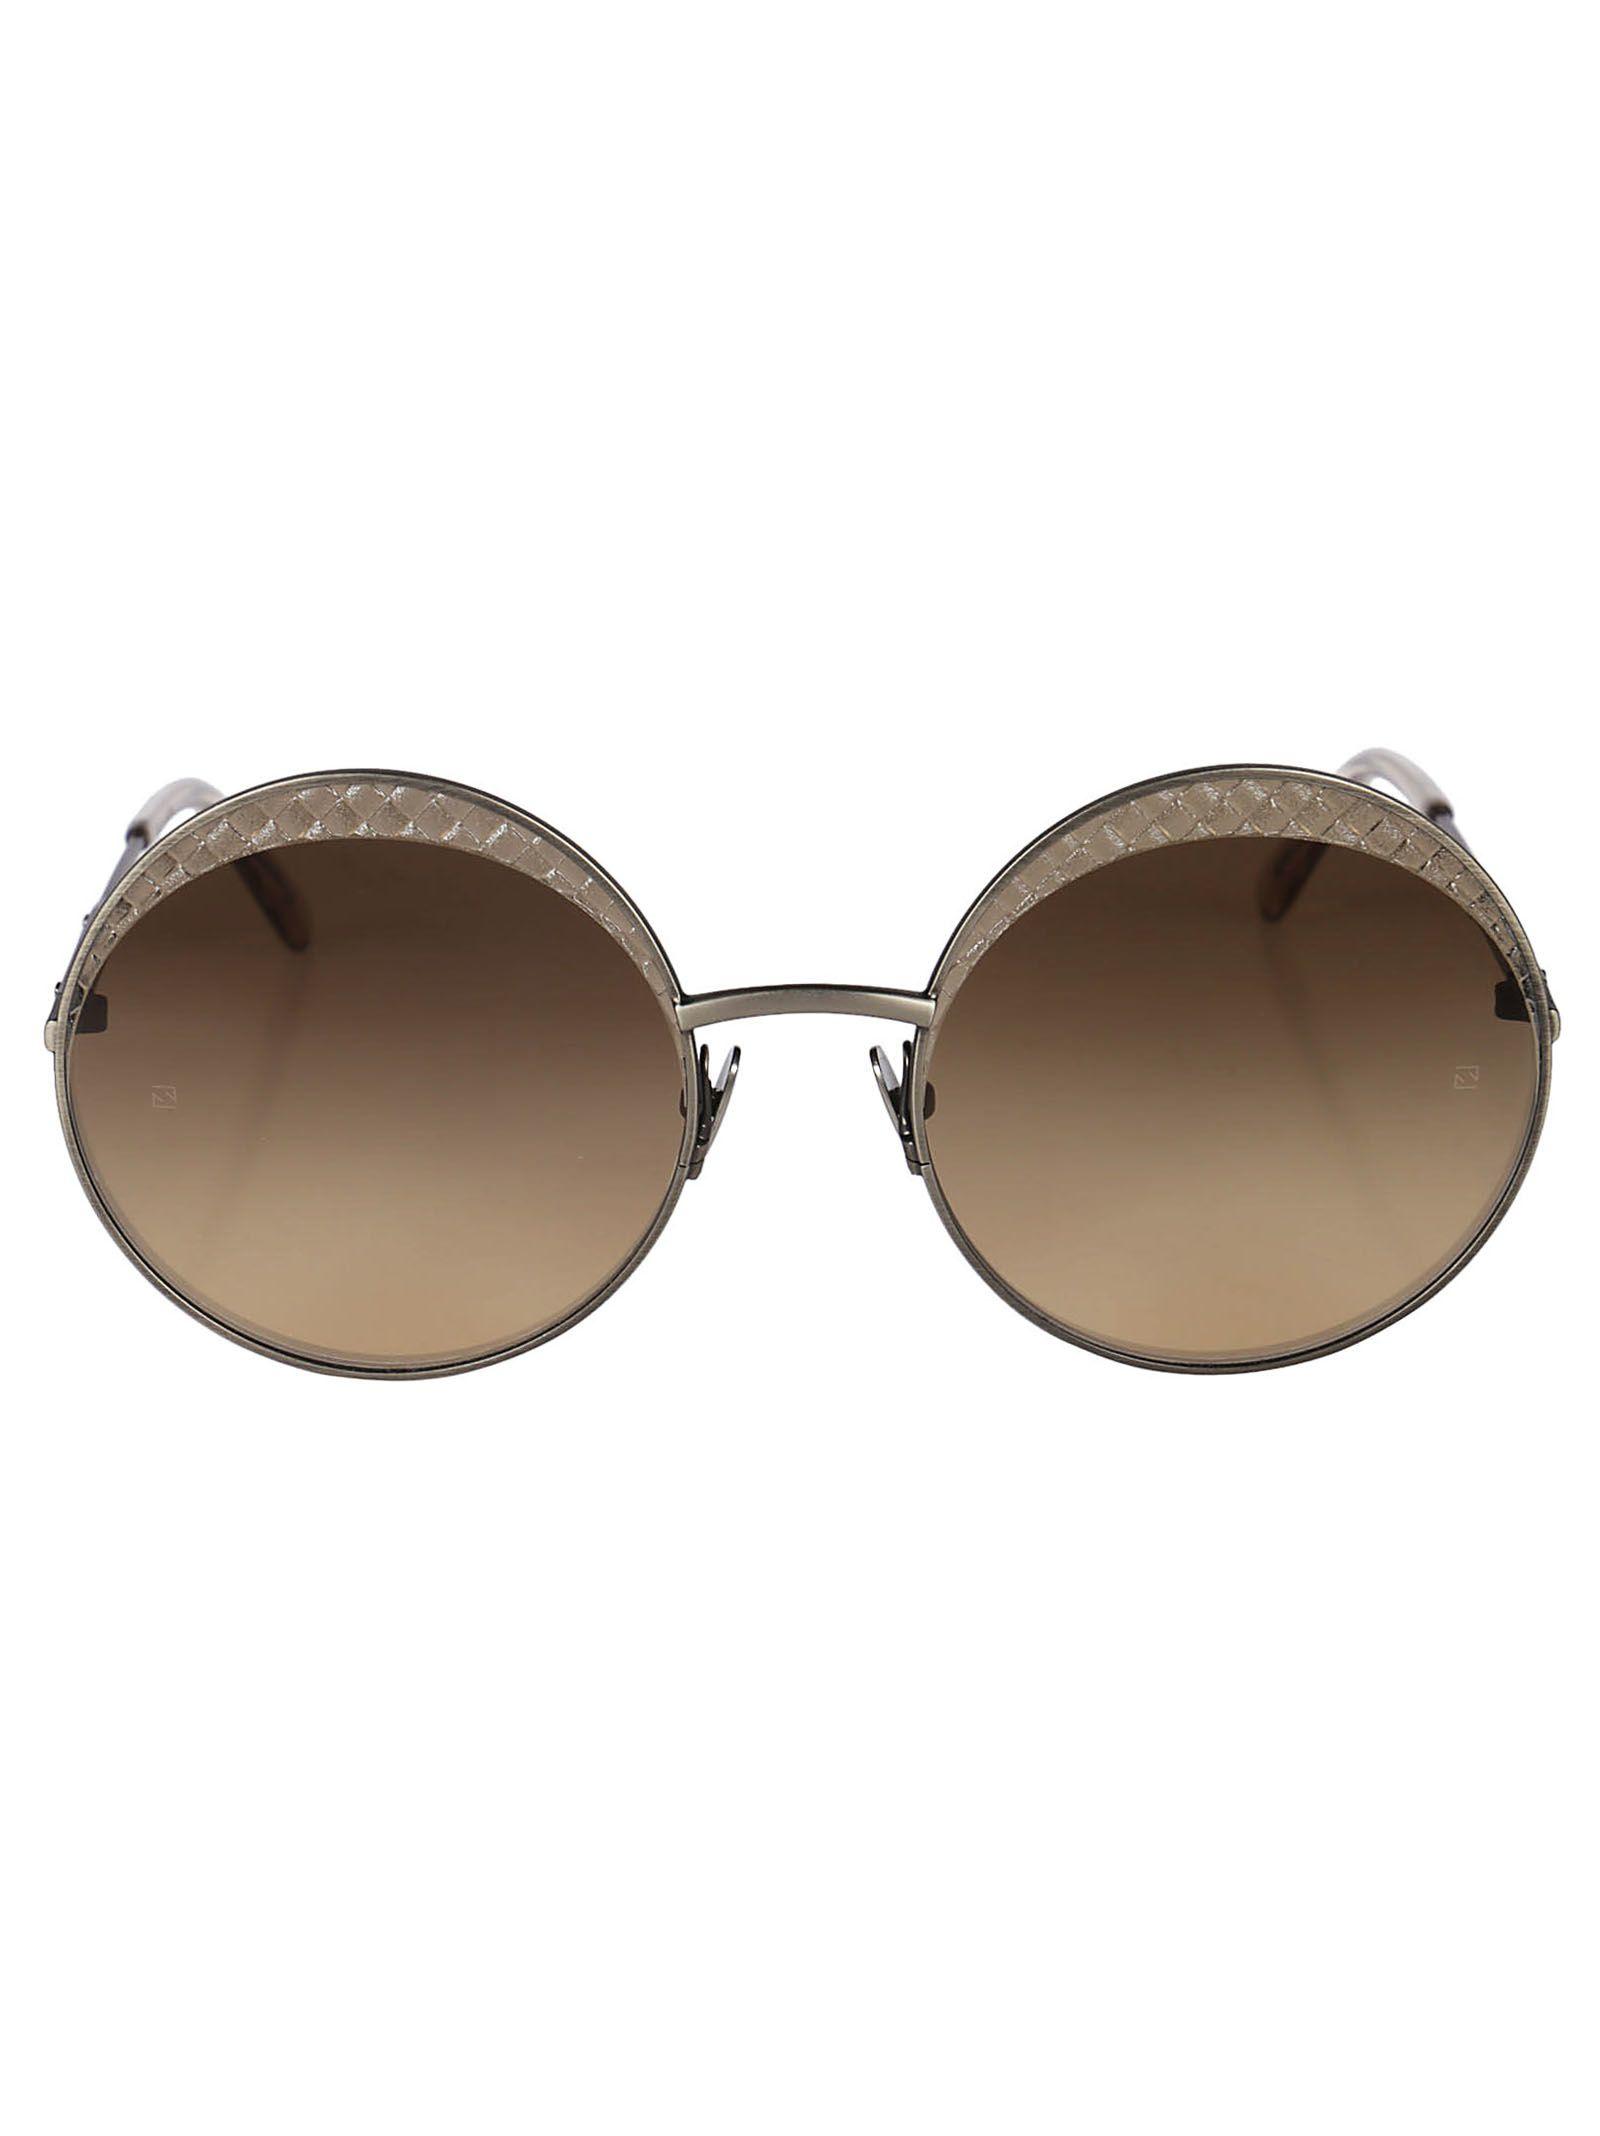 61c26b8632a Bottega Veneta Round Shape Sunglasses In Silver